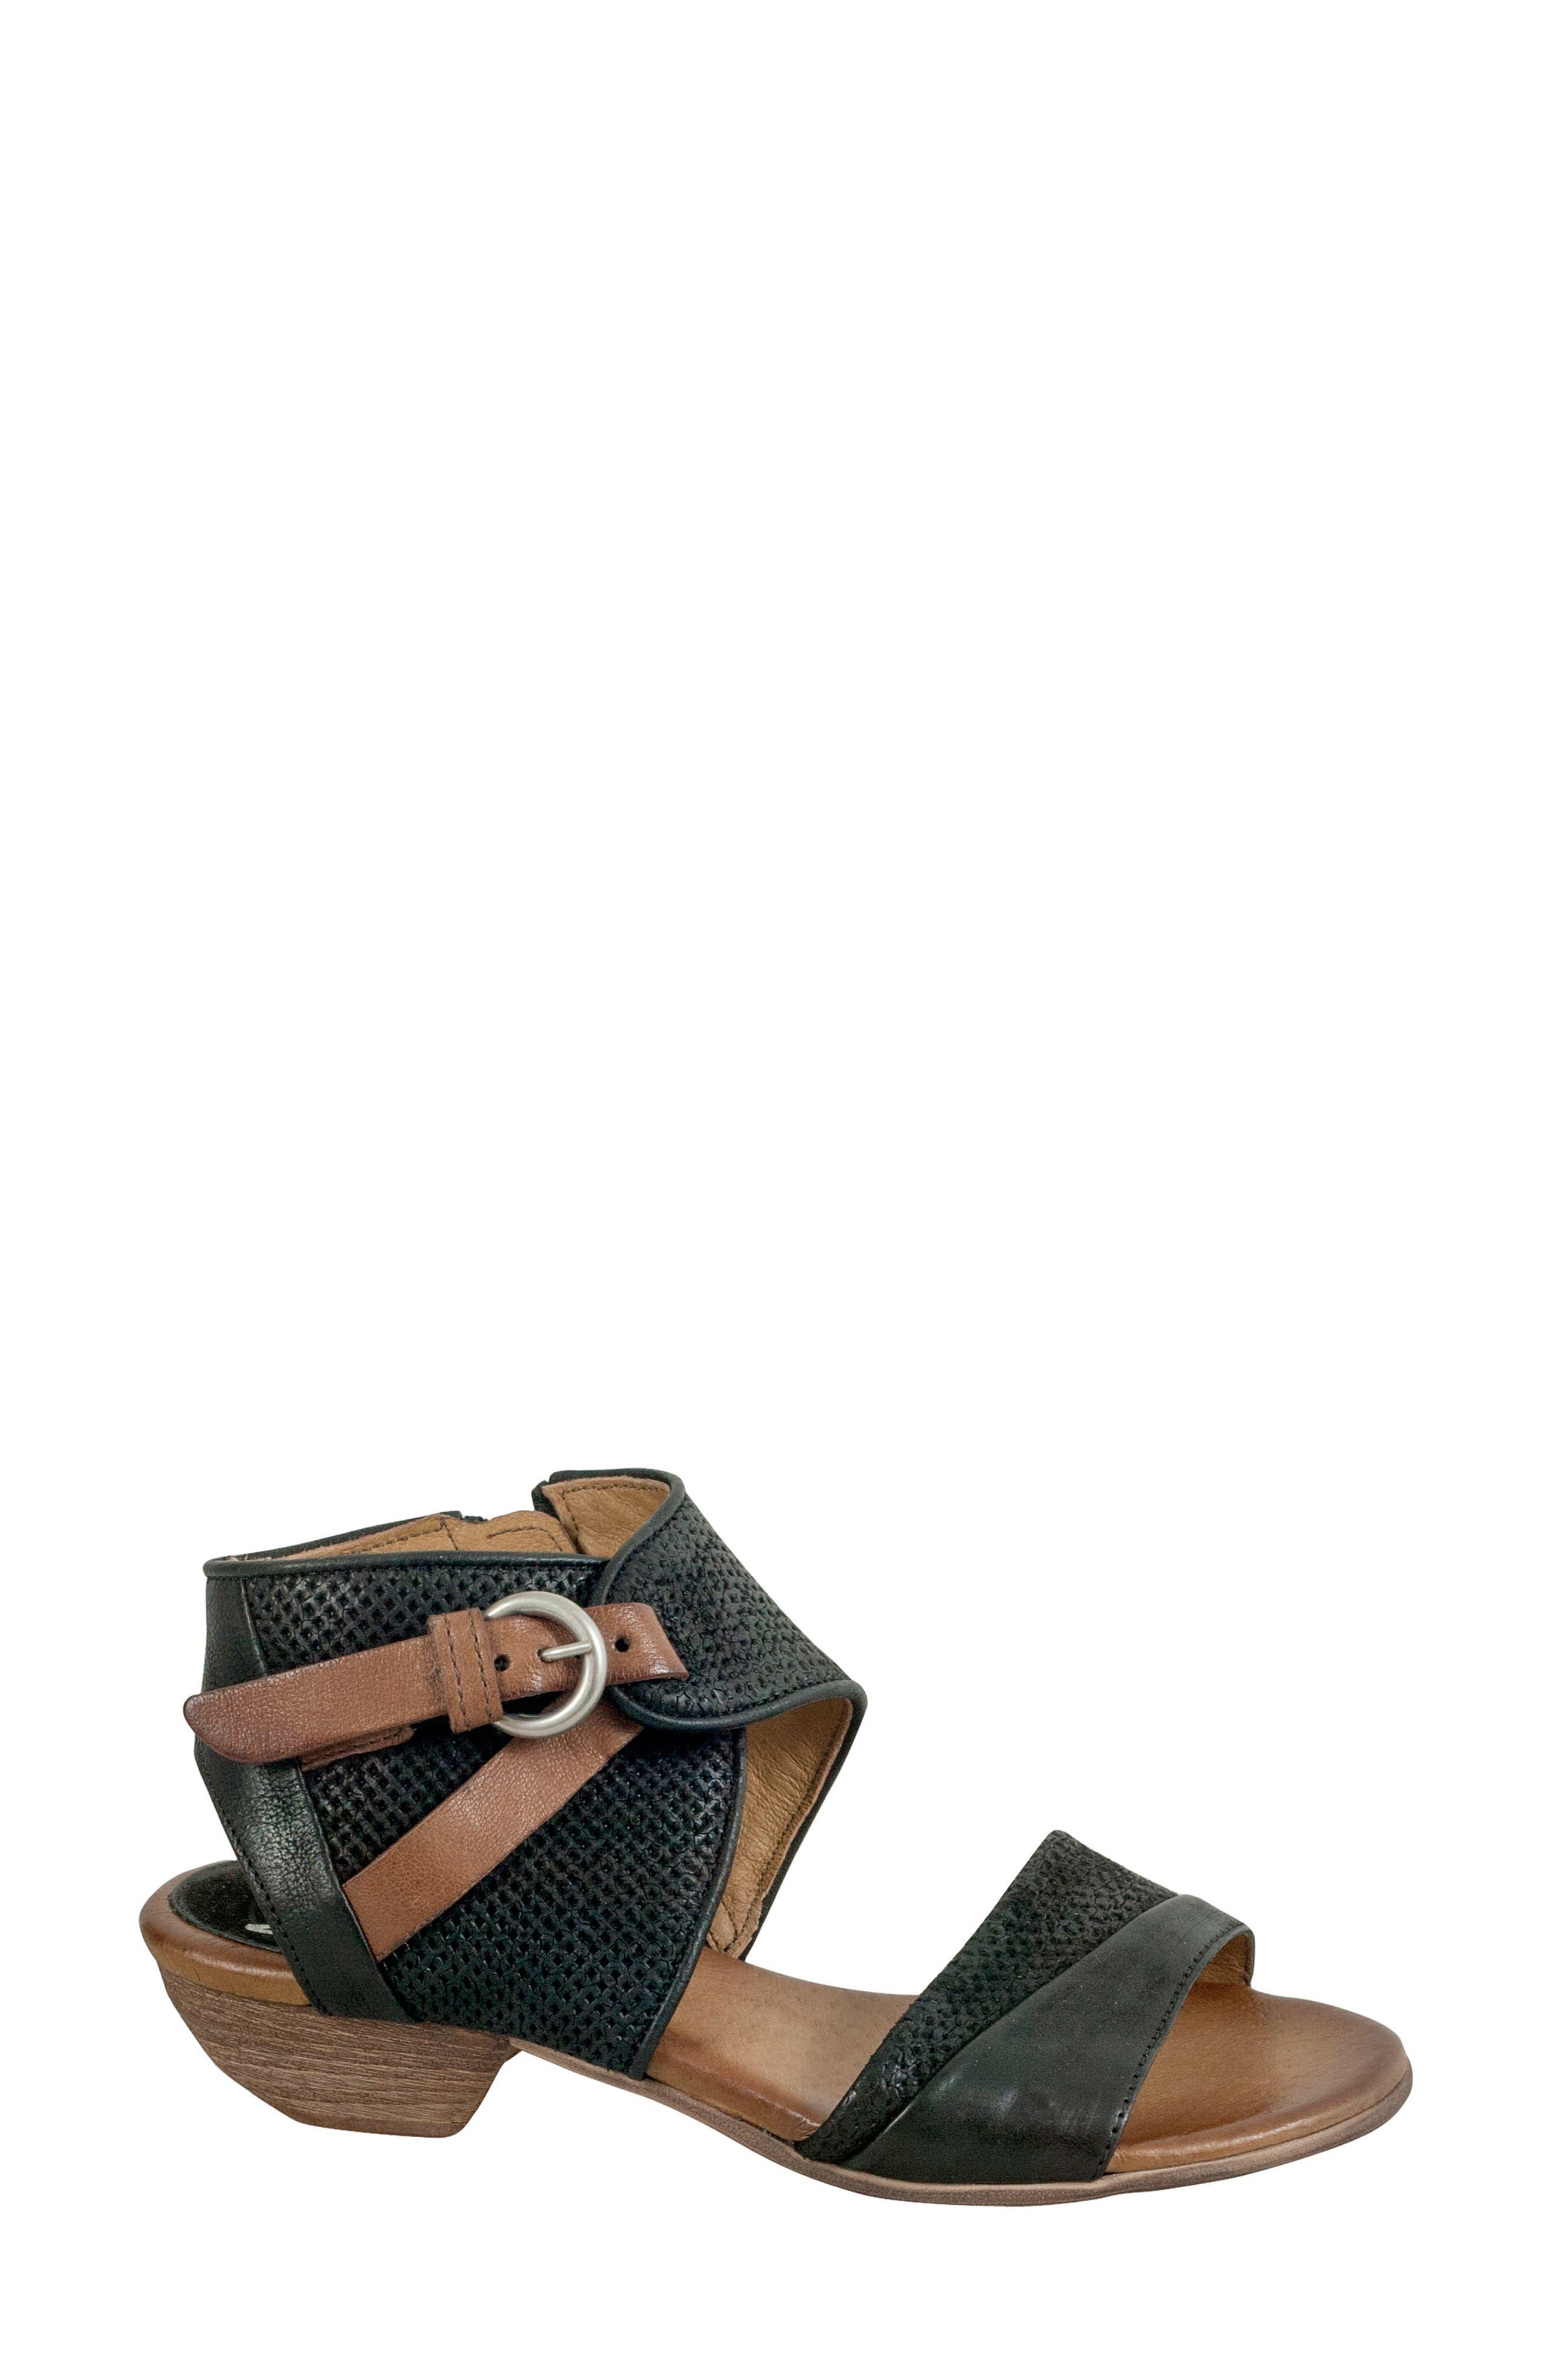 Chatham Textured Sandal,                             Alternate thumbnail 3, color,                             001